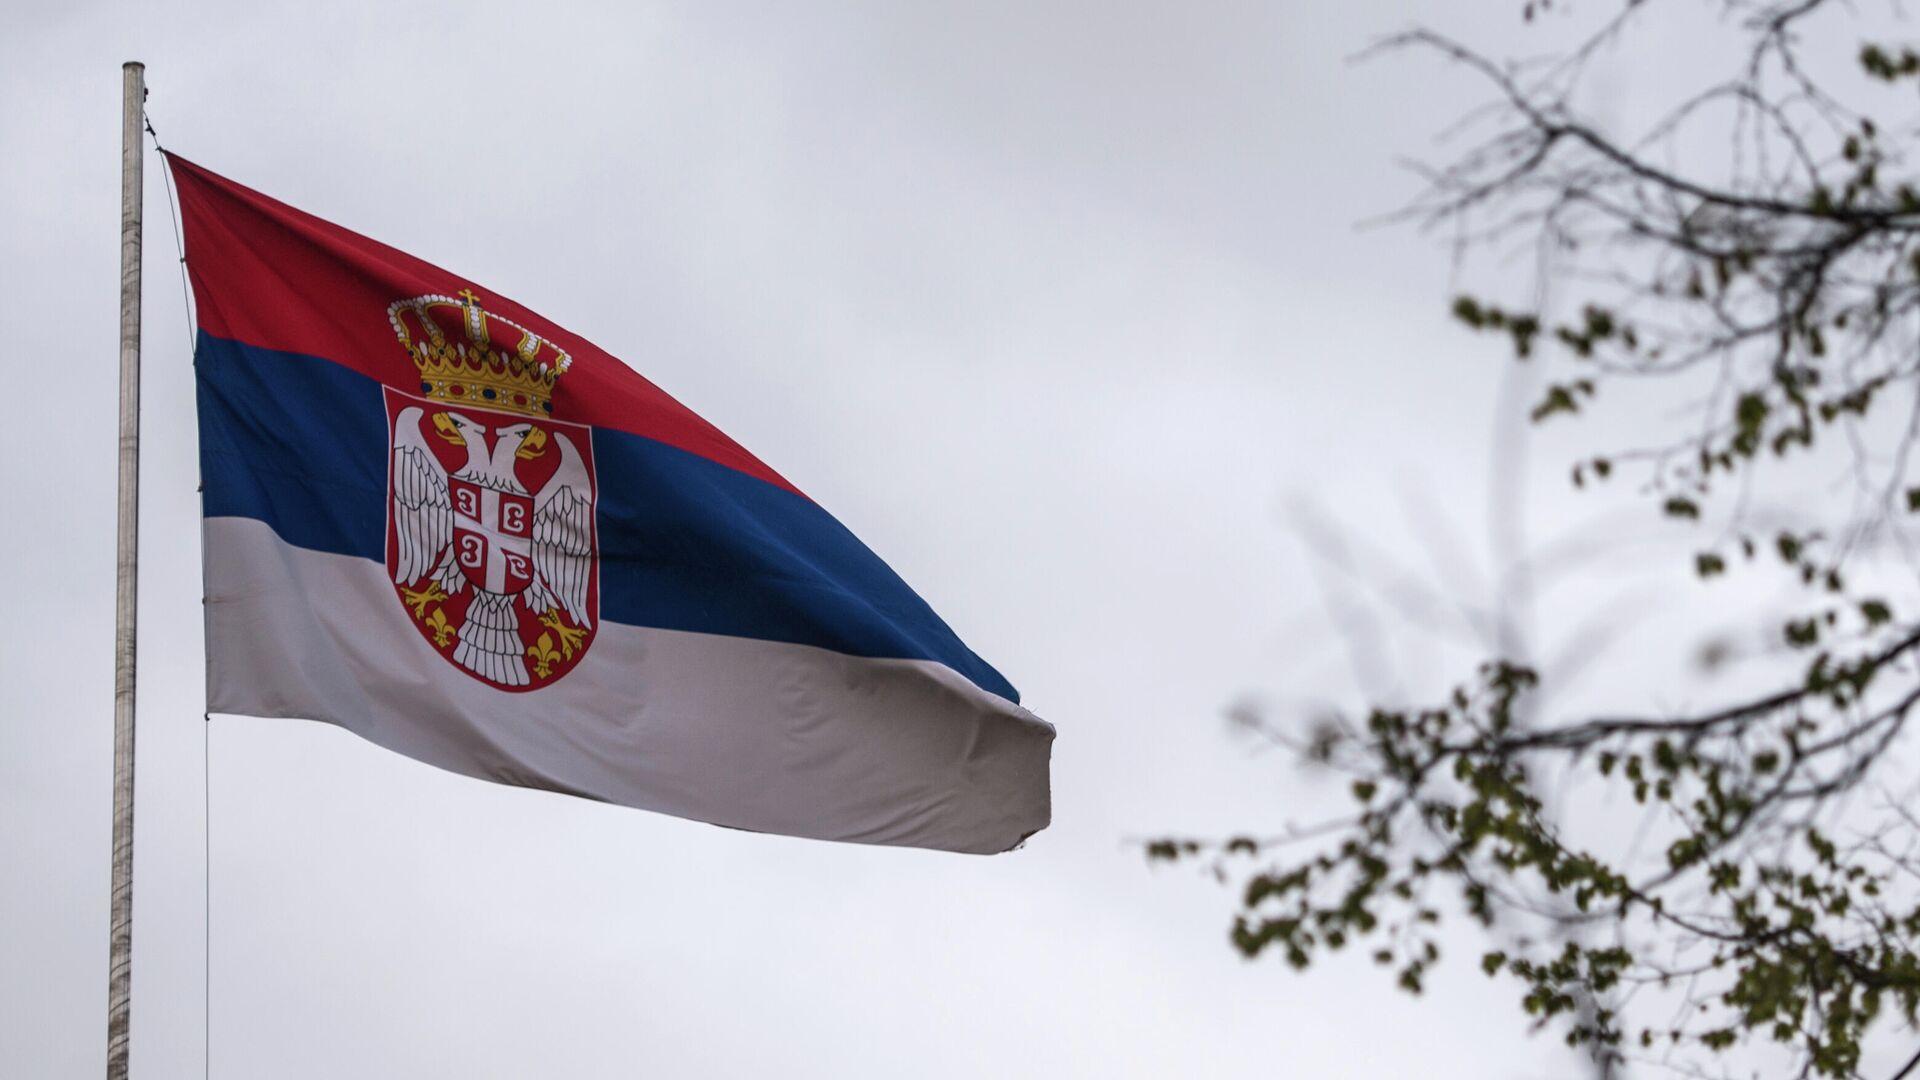 Serbiens Flagge  - SNA, 1920, 11.10.2021